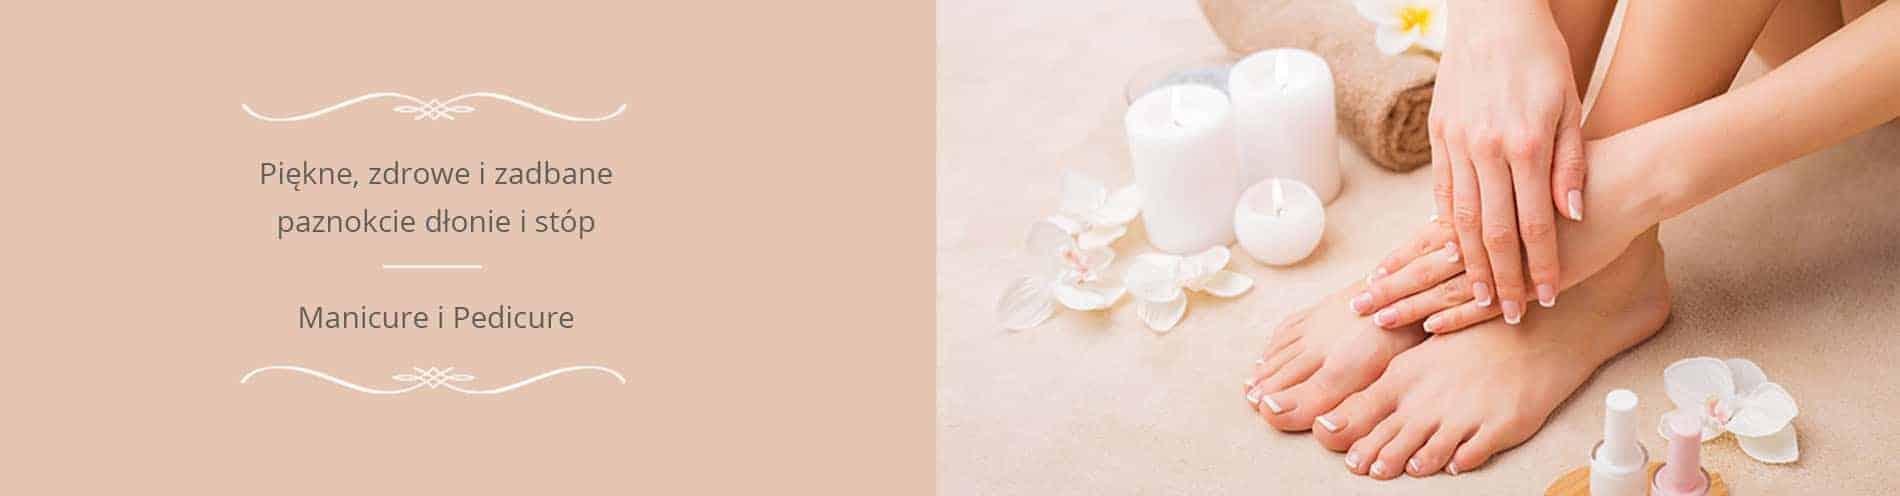 masaż salon masażu warszawa stegny